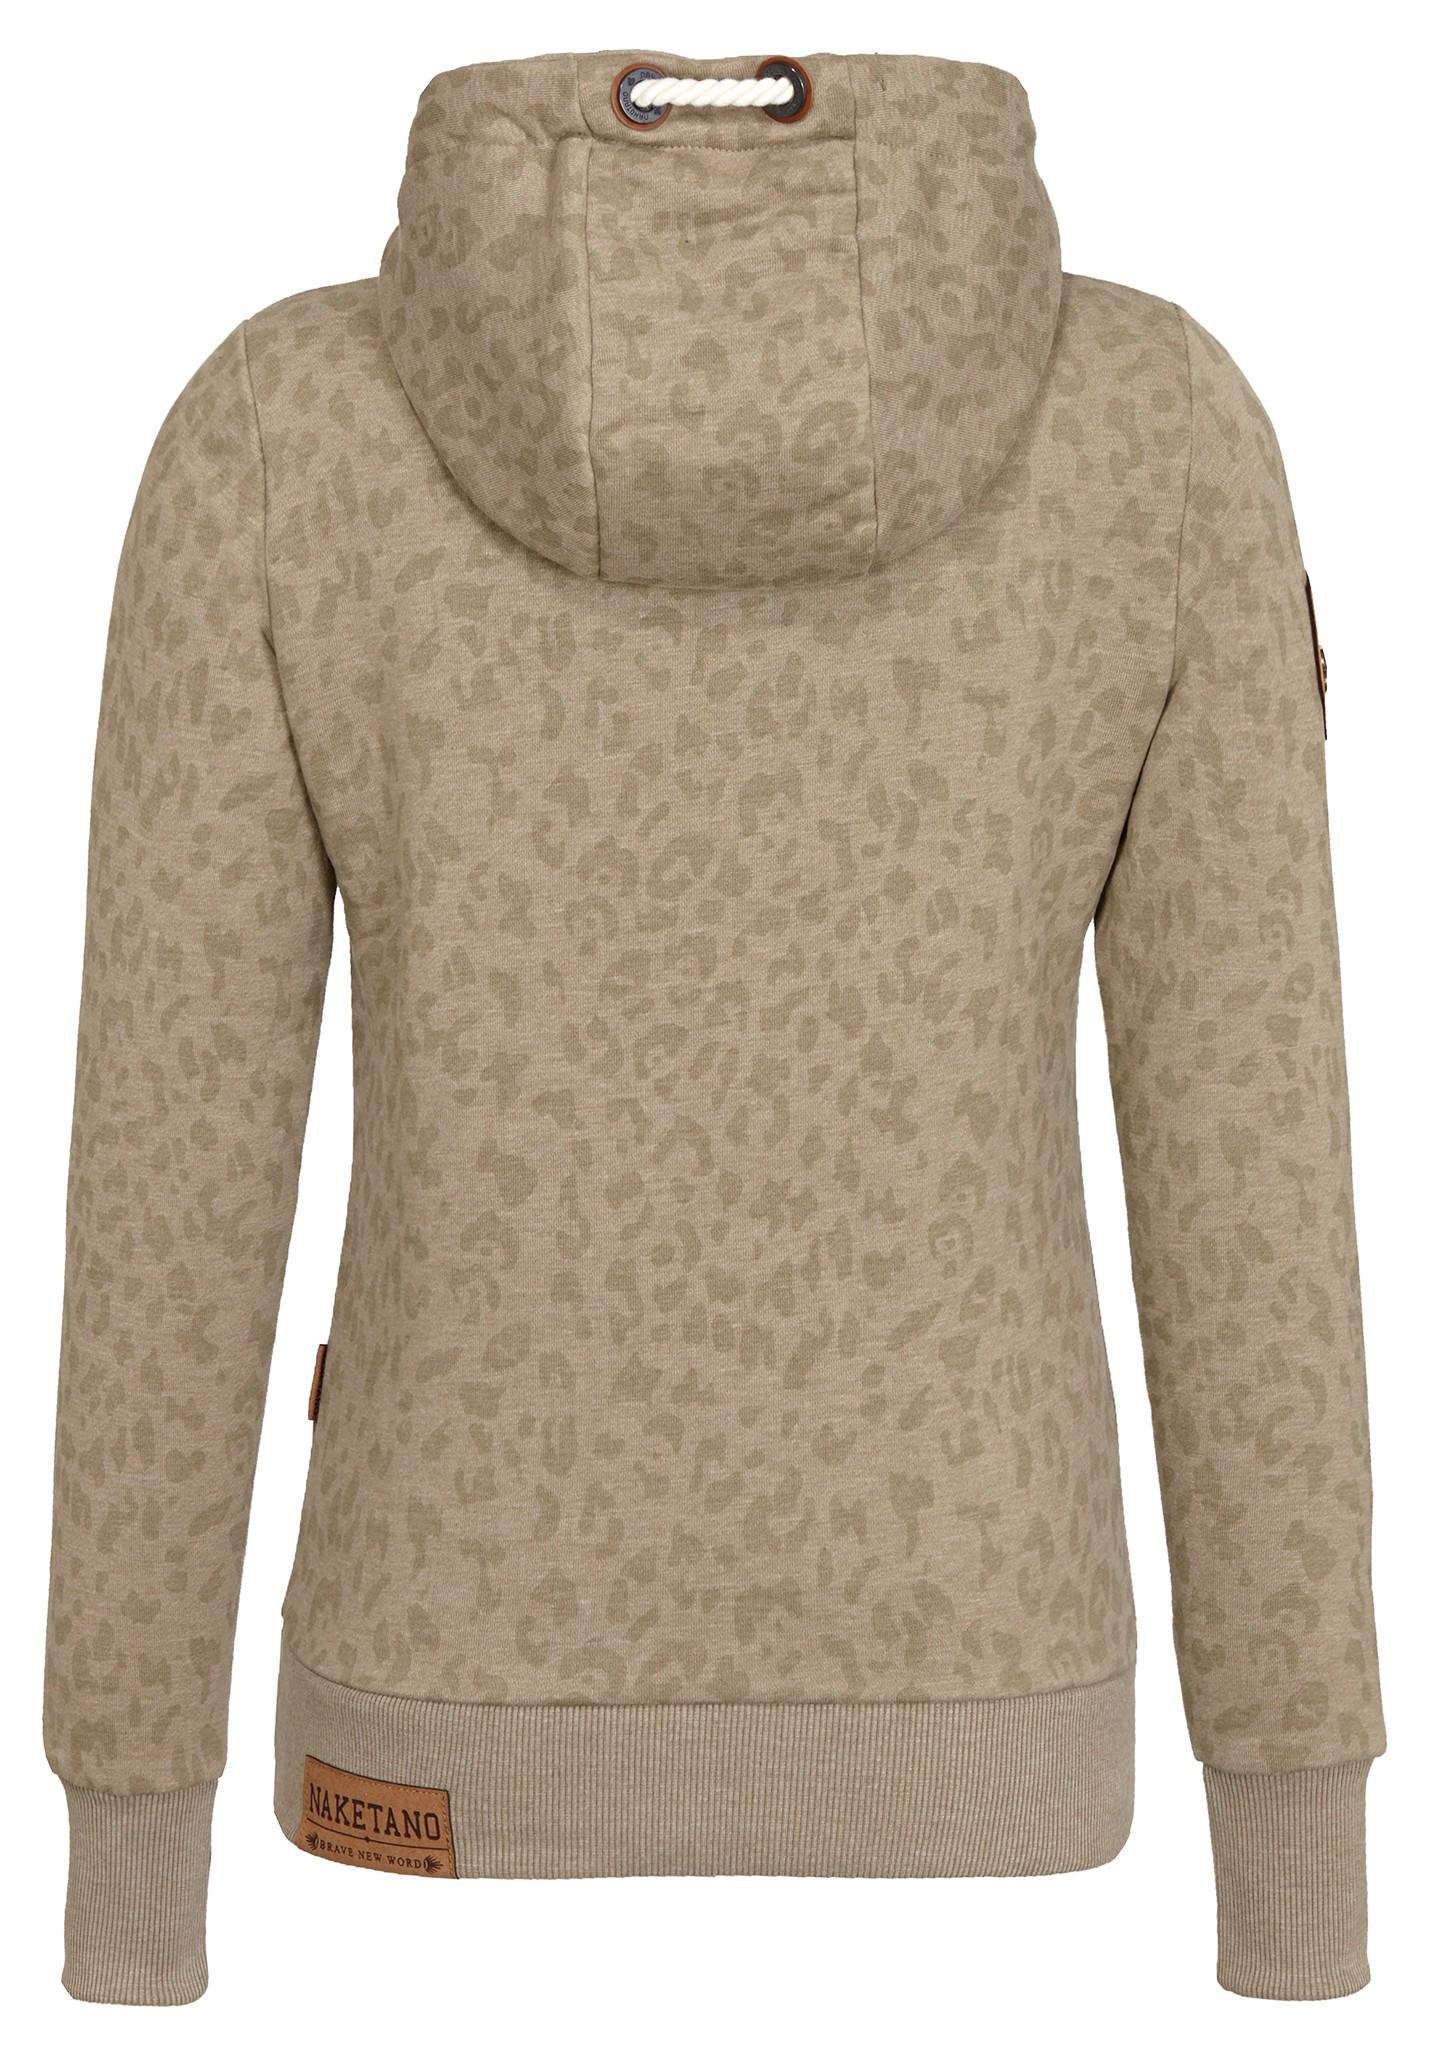 neu naketano wild schmierlappen damen kapuzenpullover pullover hoodie ebay. Black Bedroom Furniture Sets. Home Design Ideas